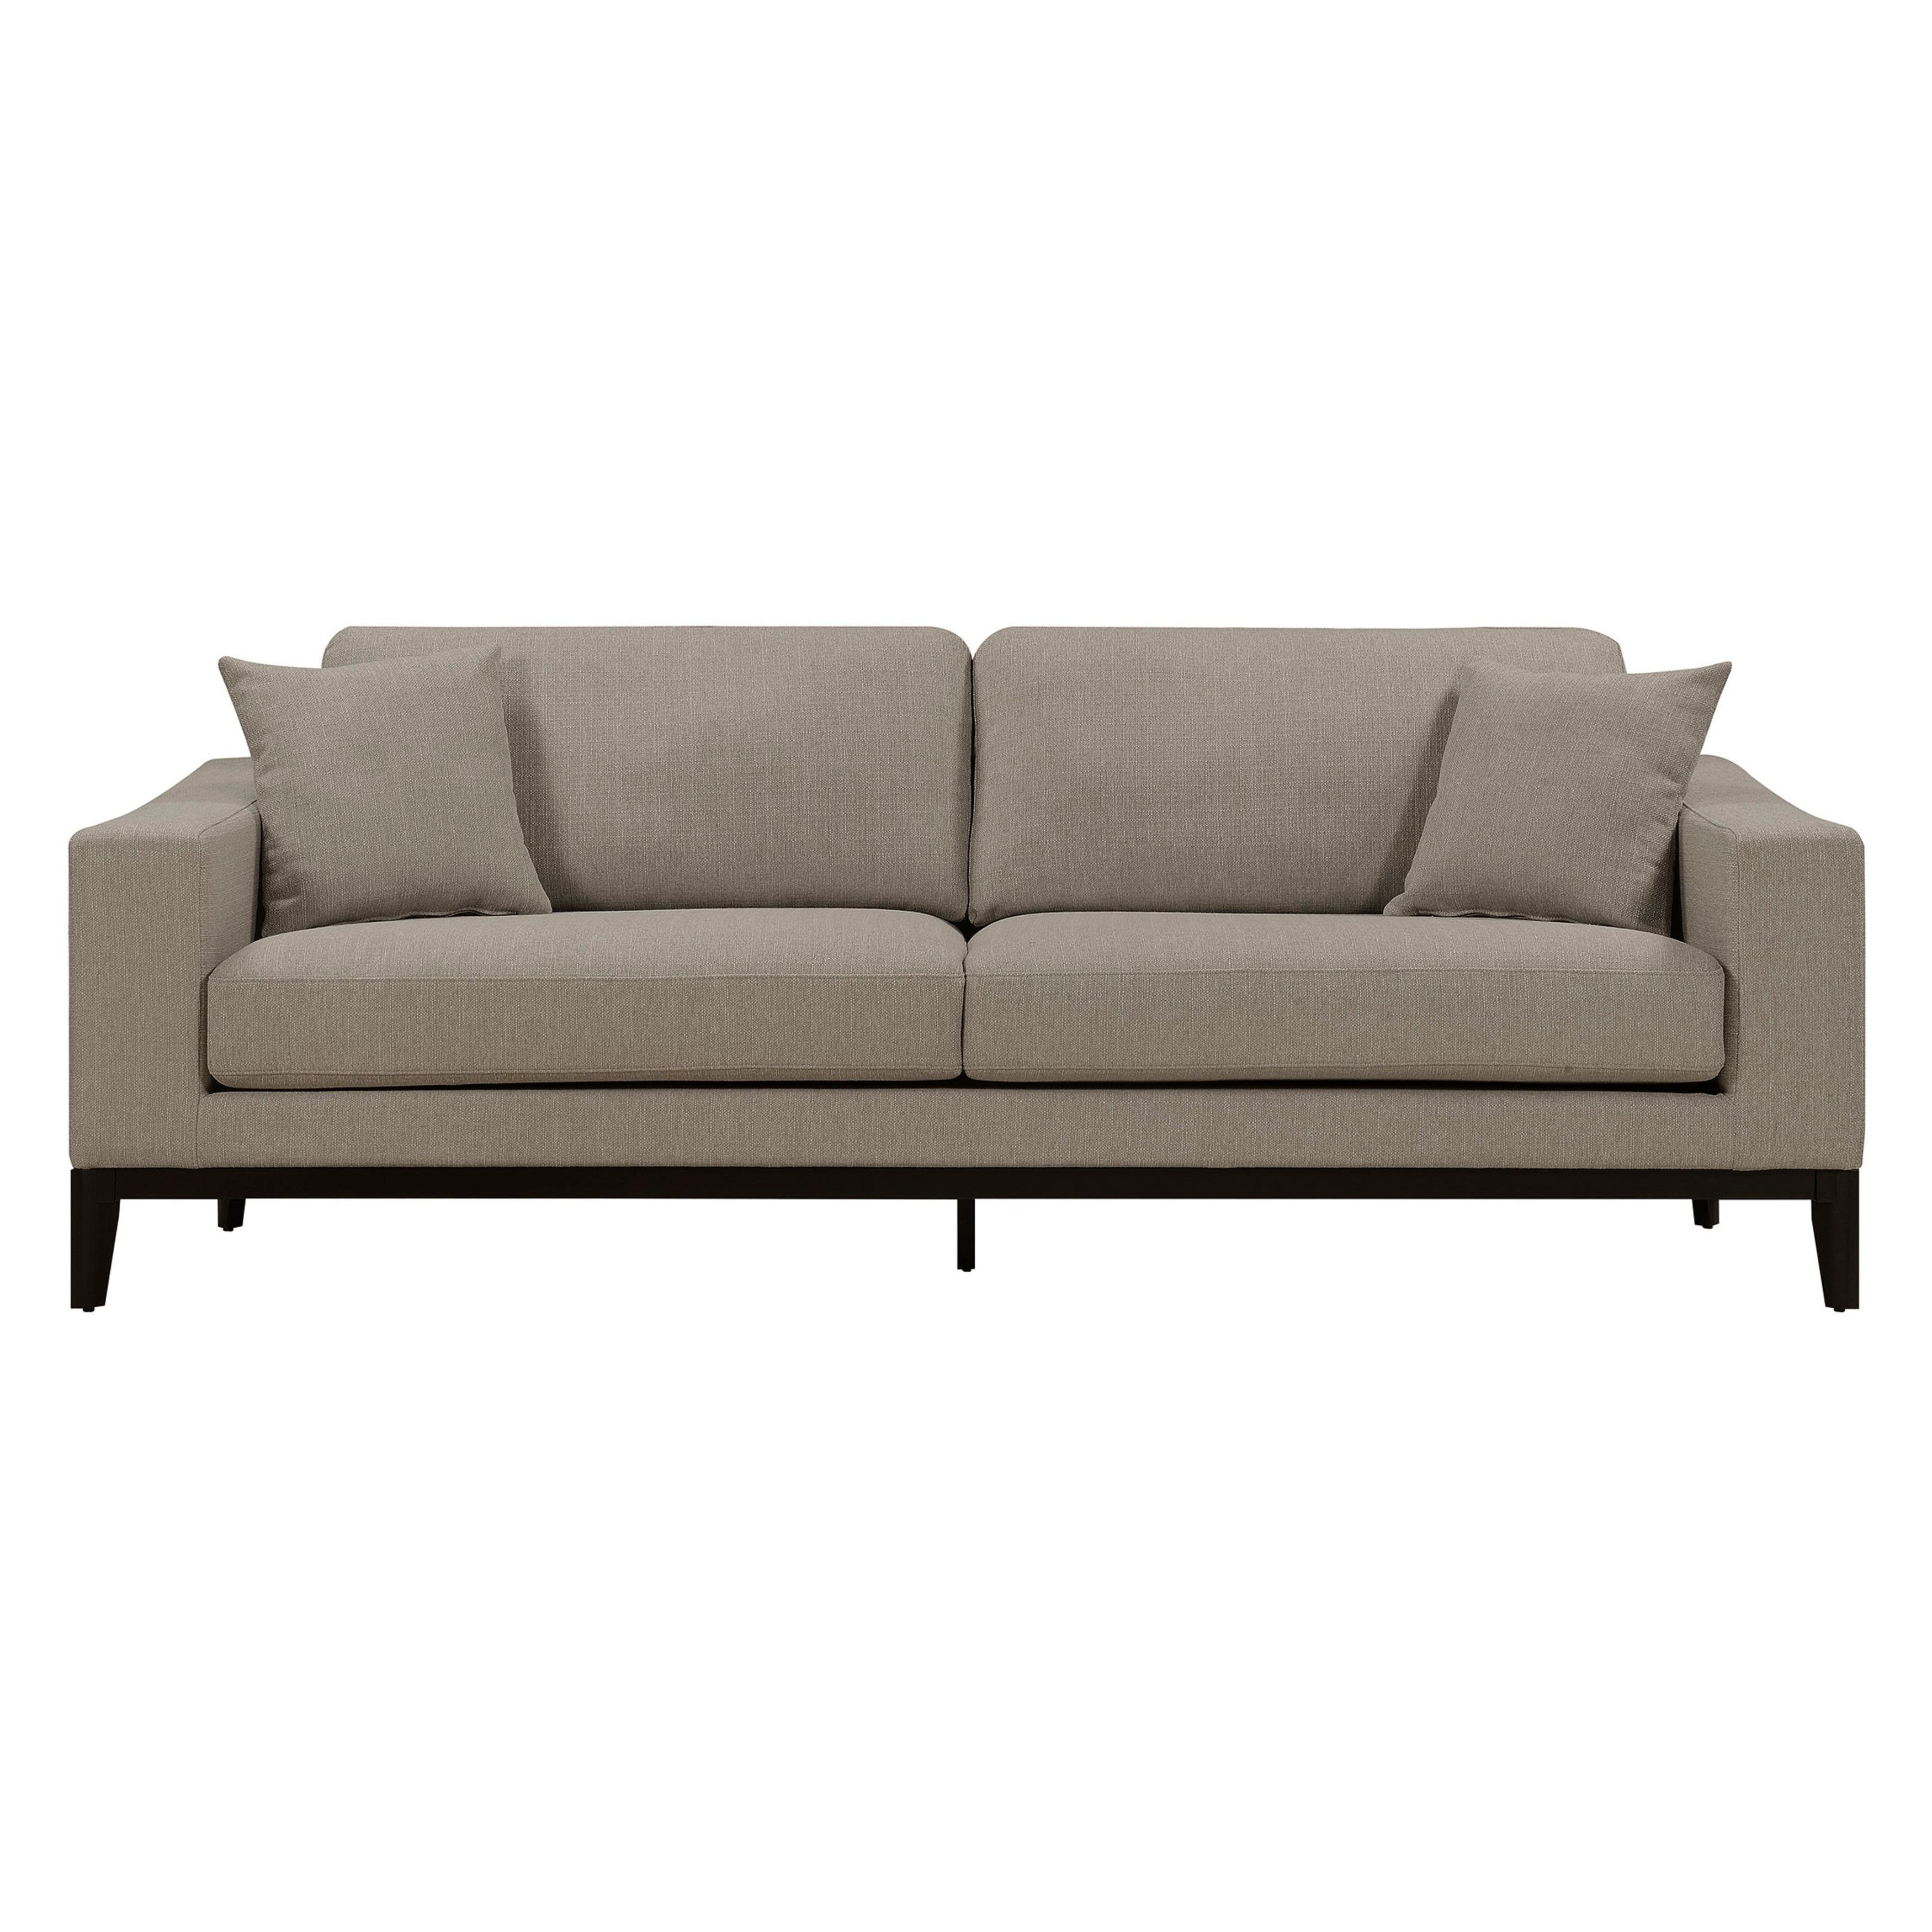 Elle Decor Olivia French Linen Sofa Free Shipping Today 18228016